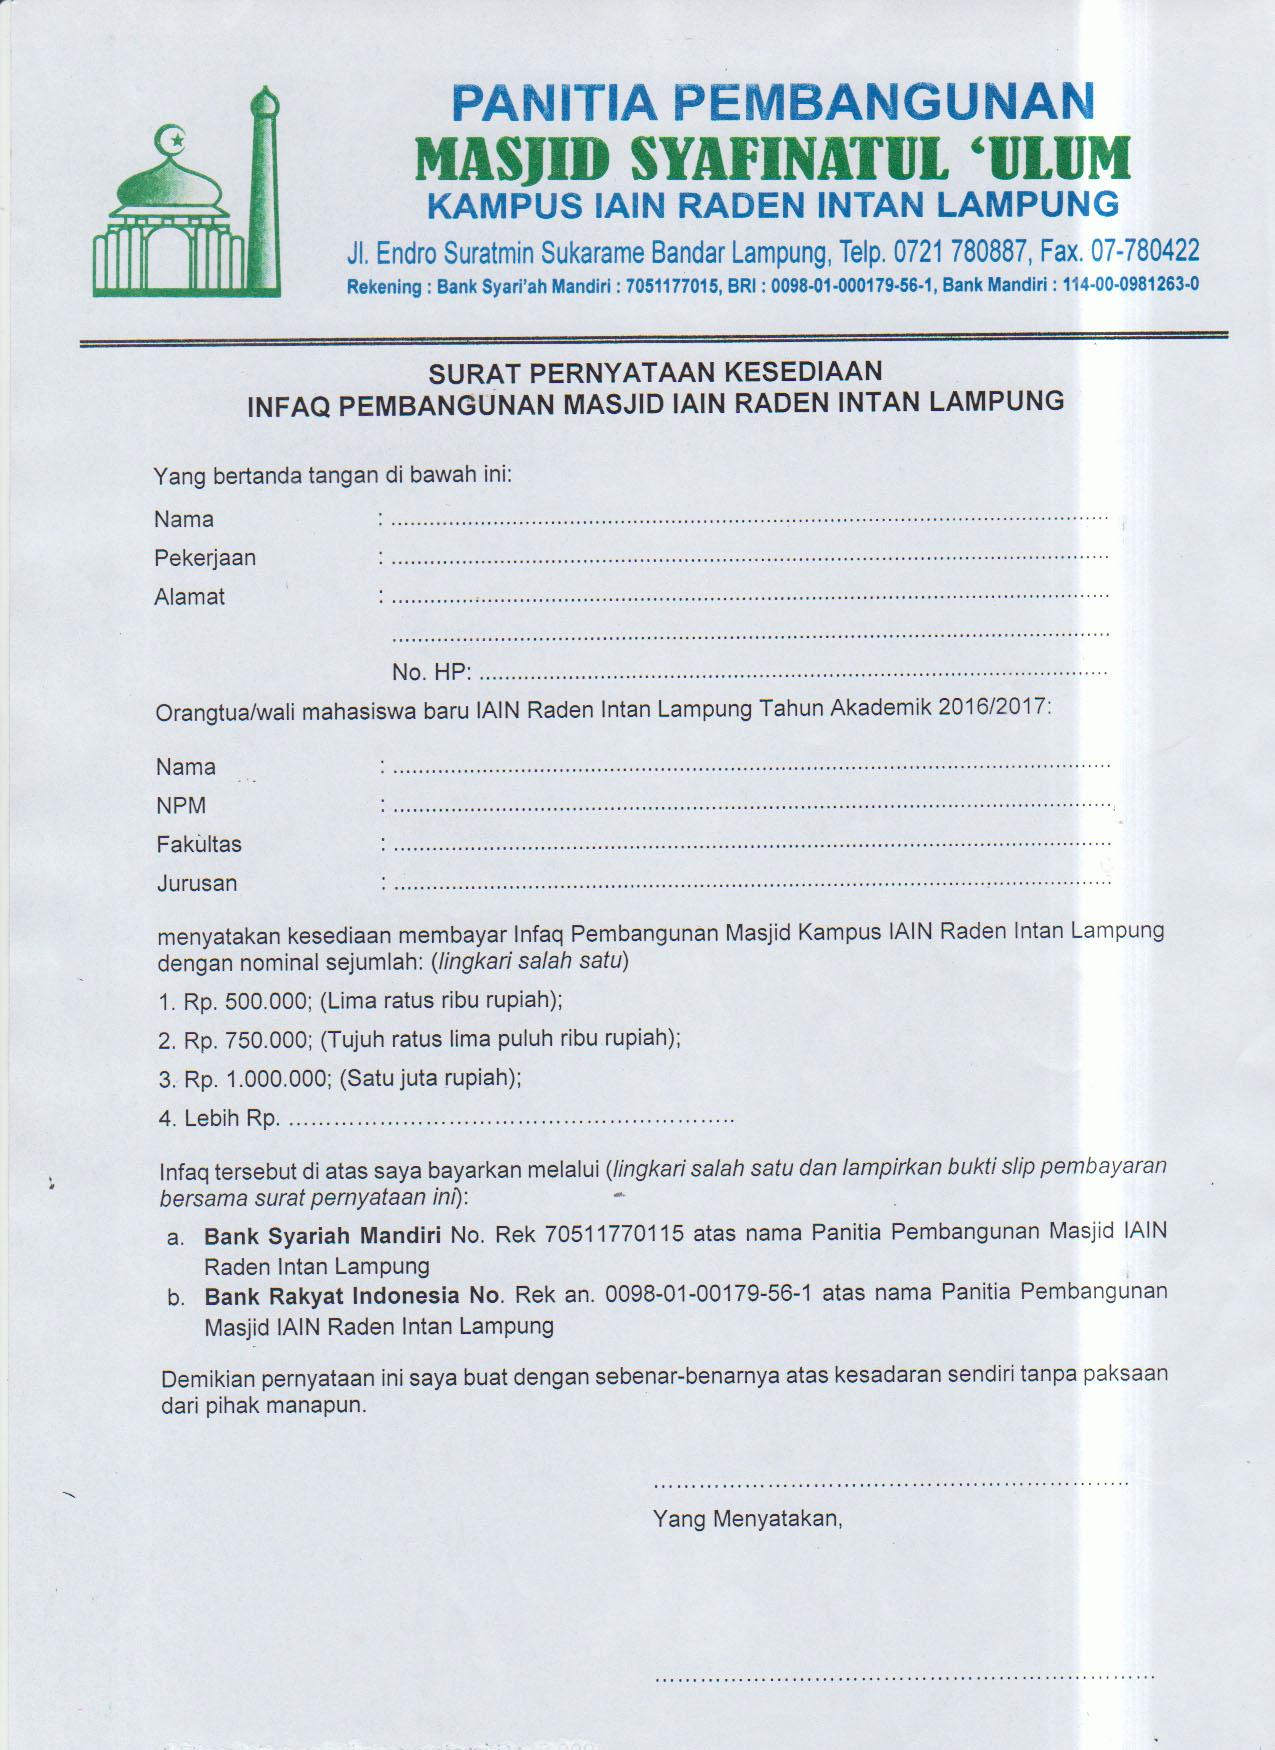 Jadwal Pembayaran Dan Syarat Banding Ukt Jalur Span Ptkin 2018 Universitas Islam Negeri Raden Intan Lampung Uin Raden Intan Lampung